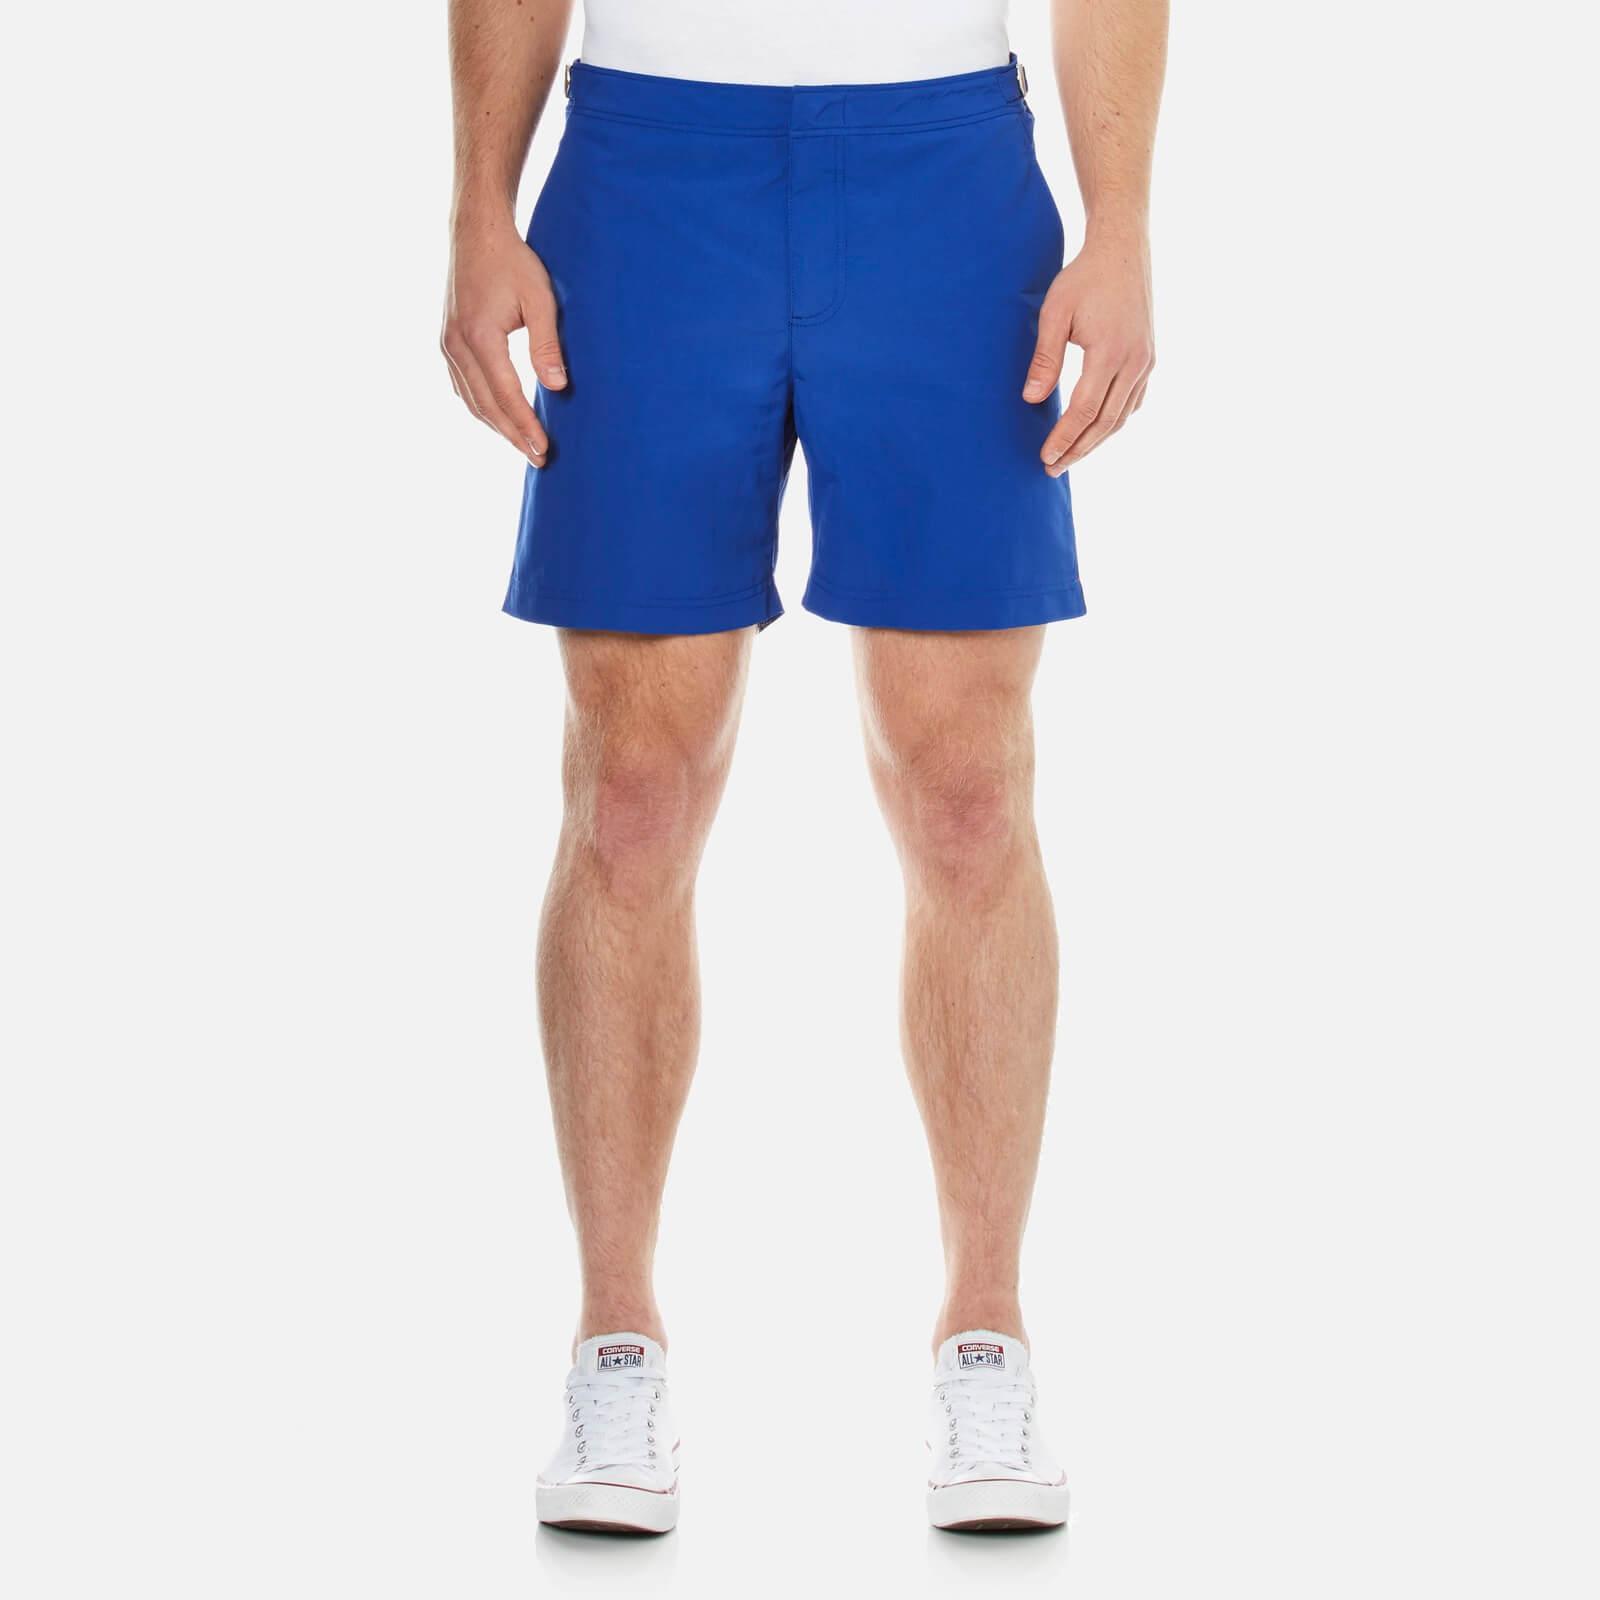 3c20dcd64f Orlebar Brown Men's Mid Length Bulldog Swim Shorts - Cobalt - Free UK  Delivery over £50